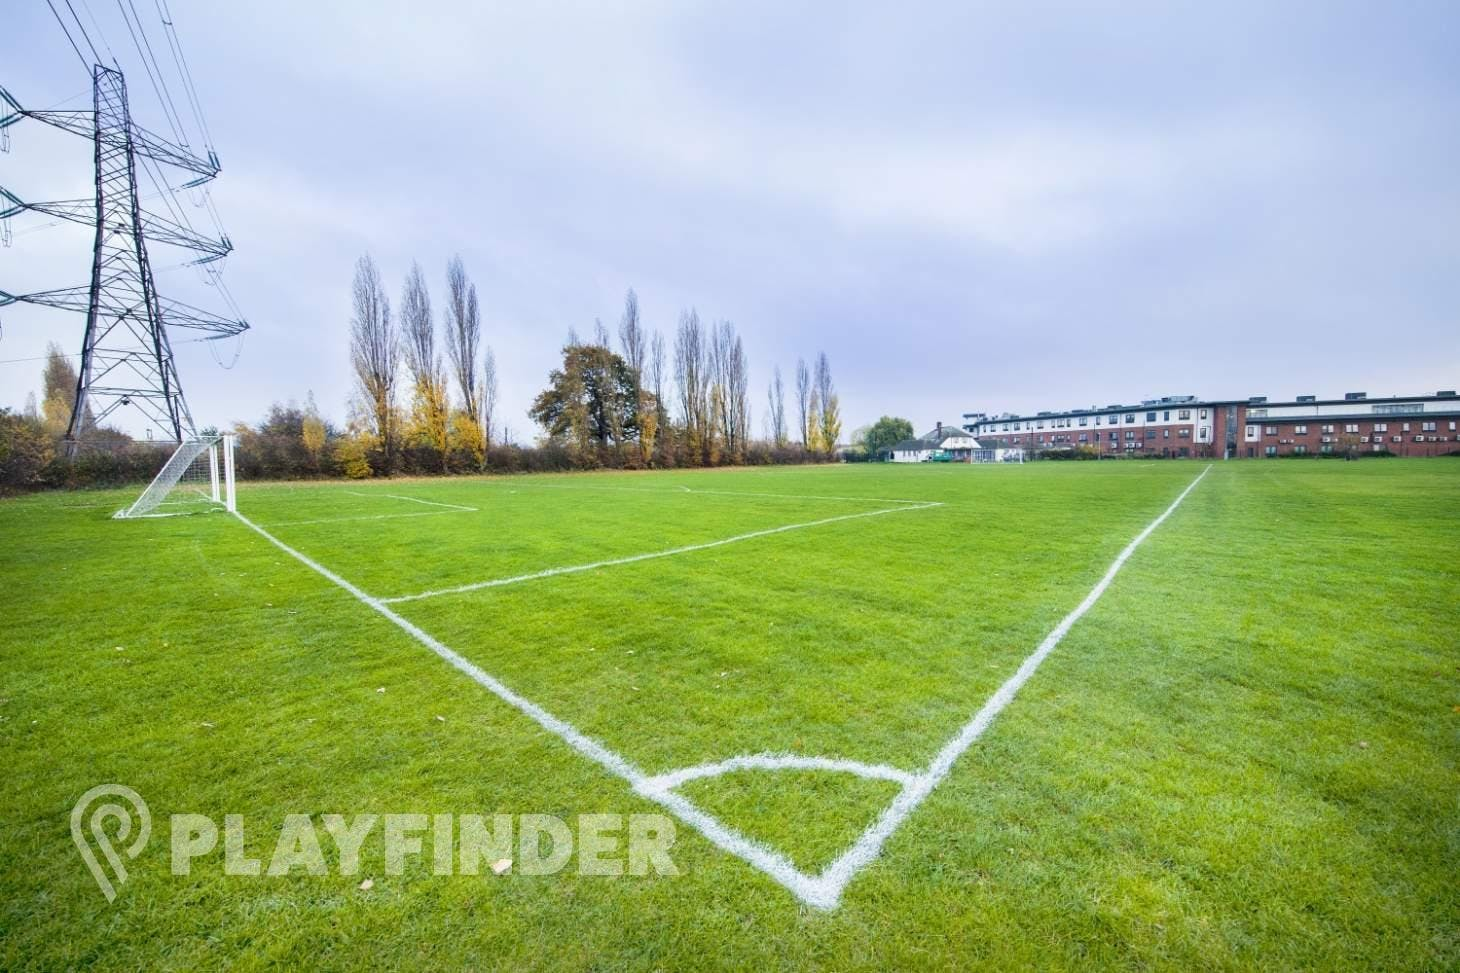 Britannia Playing Fields 11 a side | Grass football pitch